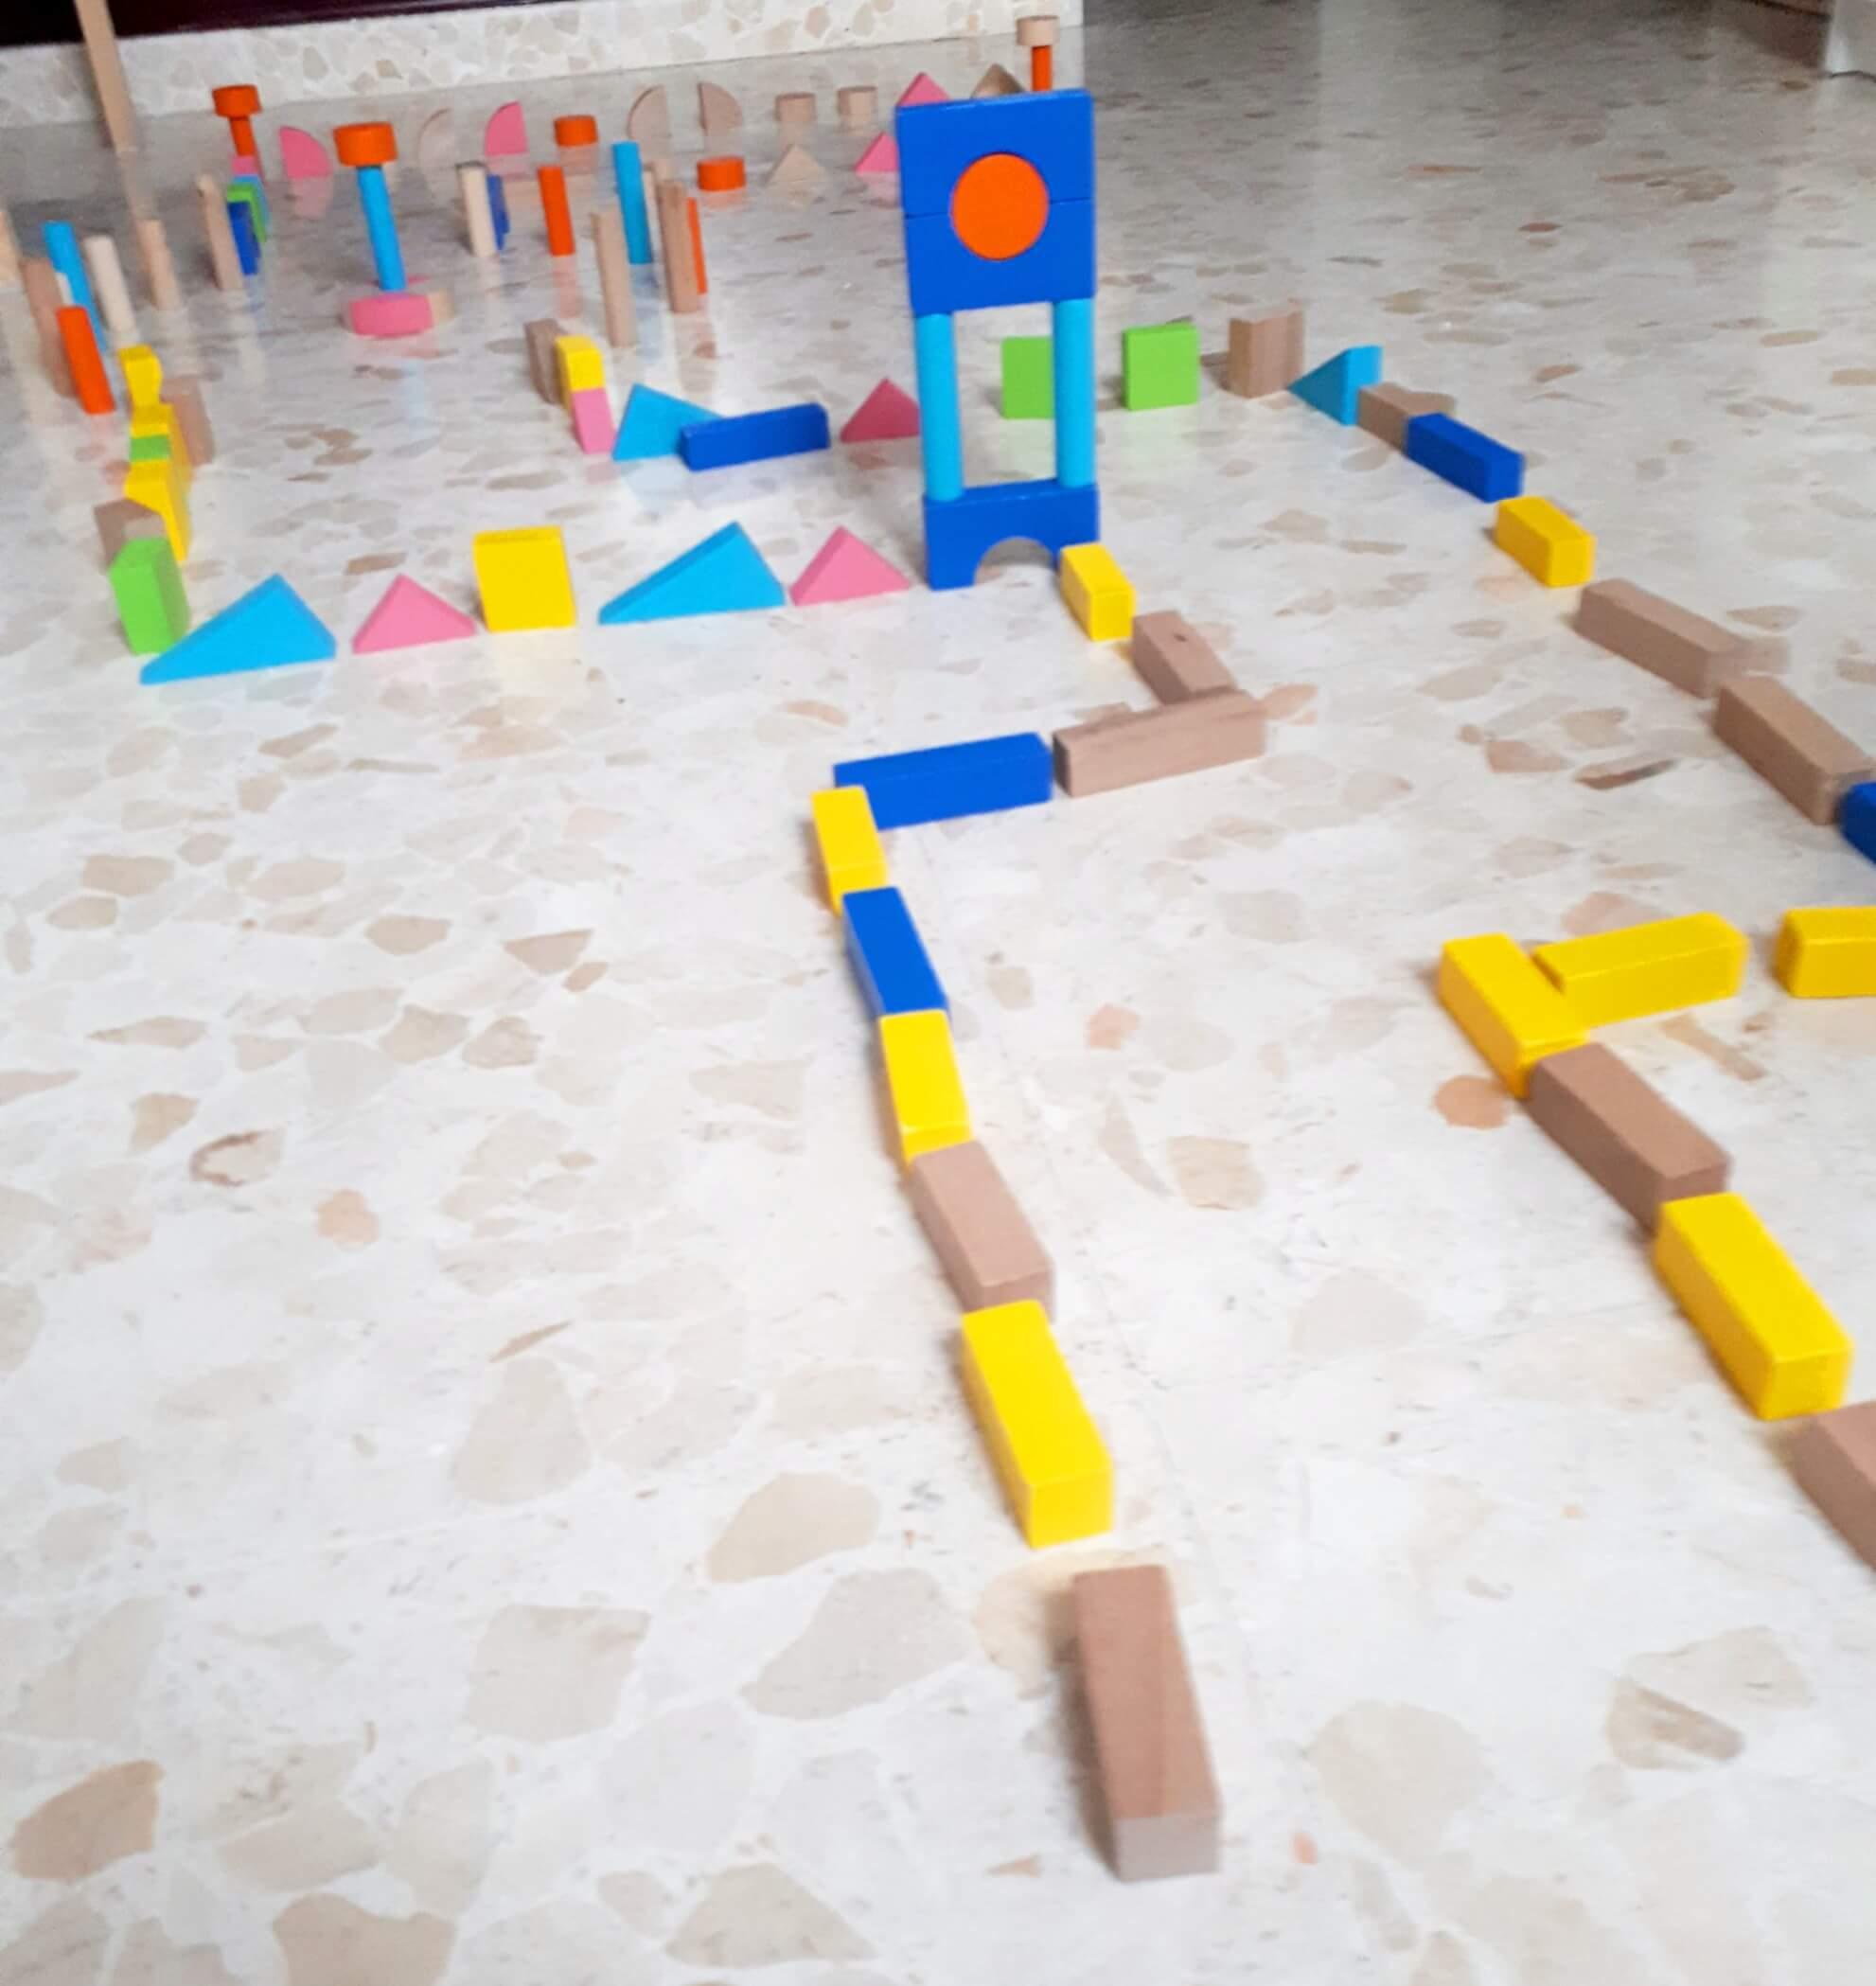 jugar con bloques